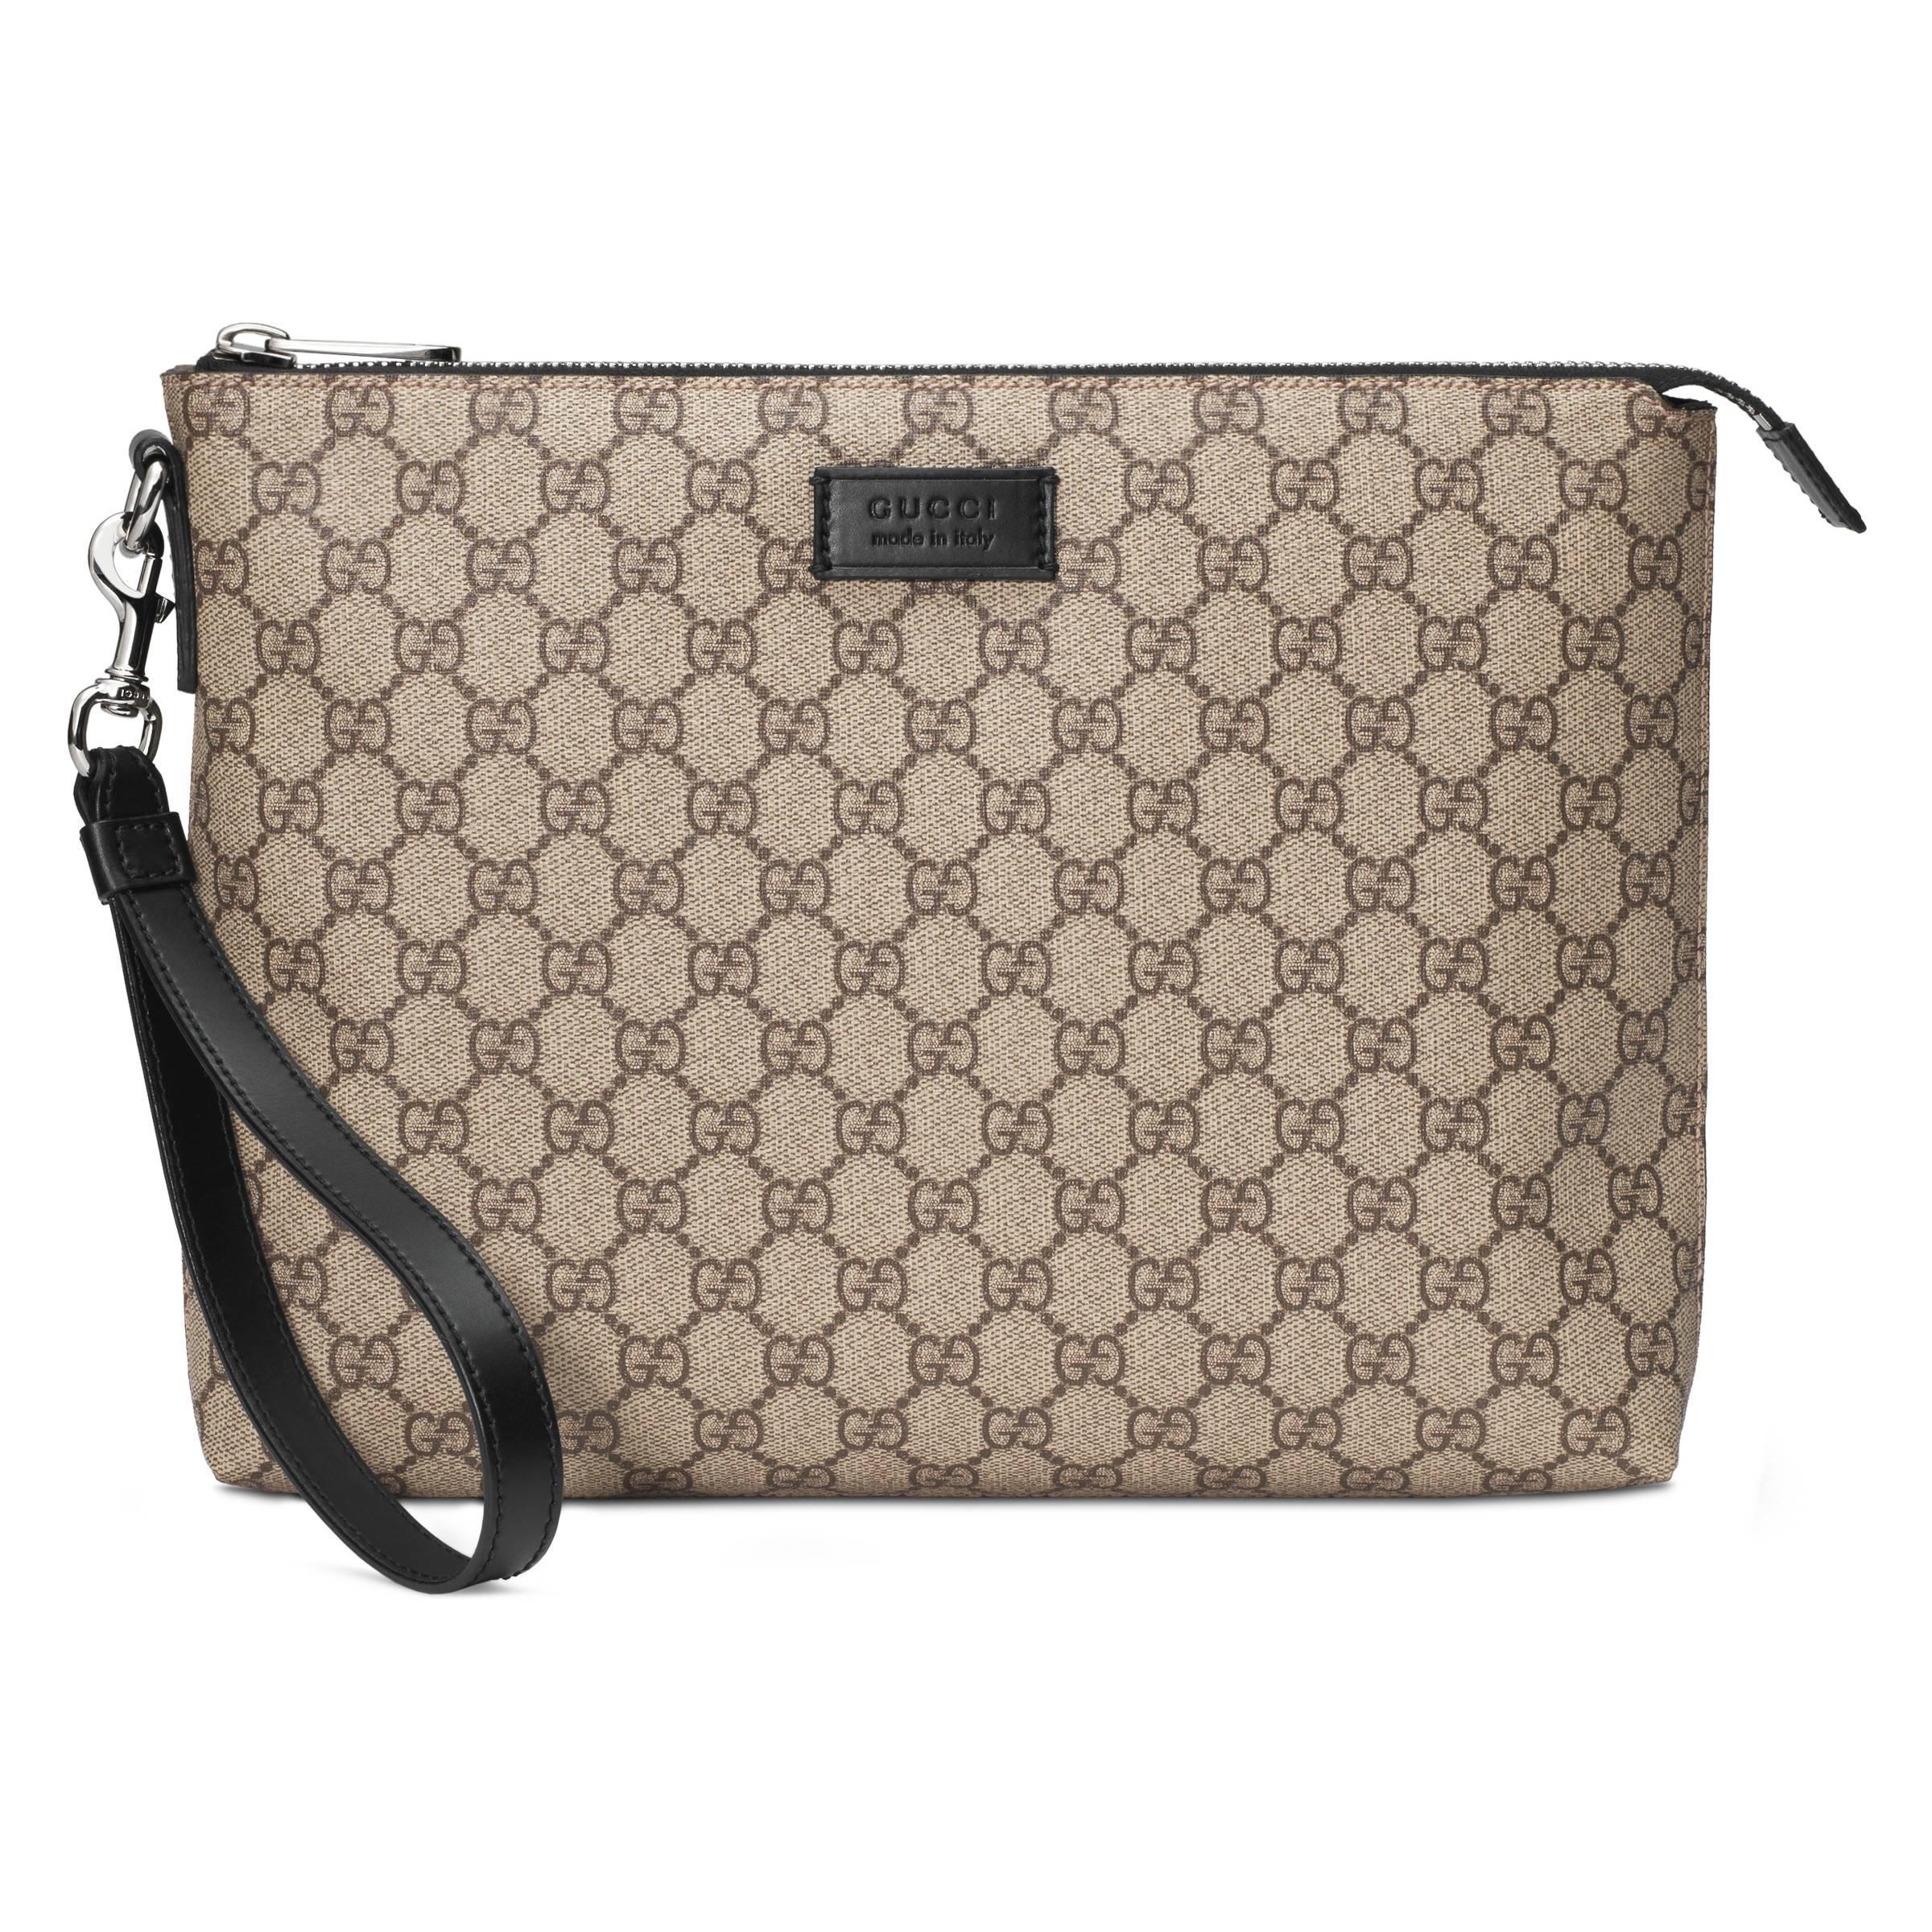 67e68676fb3 Gucci GG Supreme Men s Bag in Natural for Men - Lyst